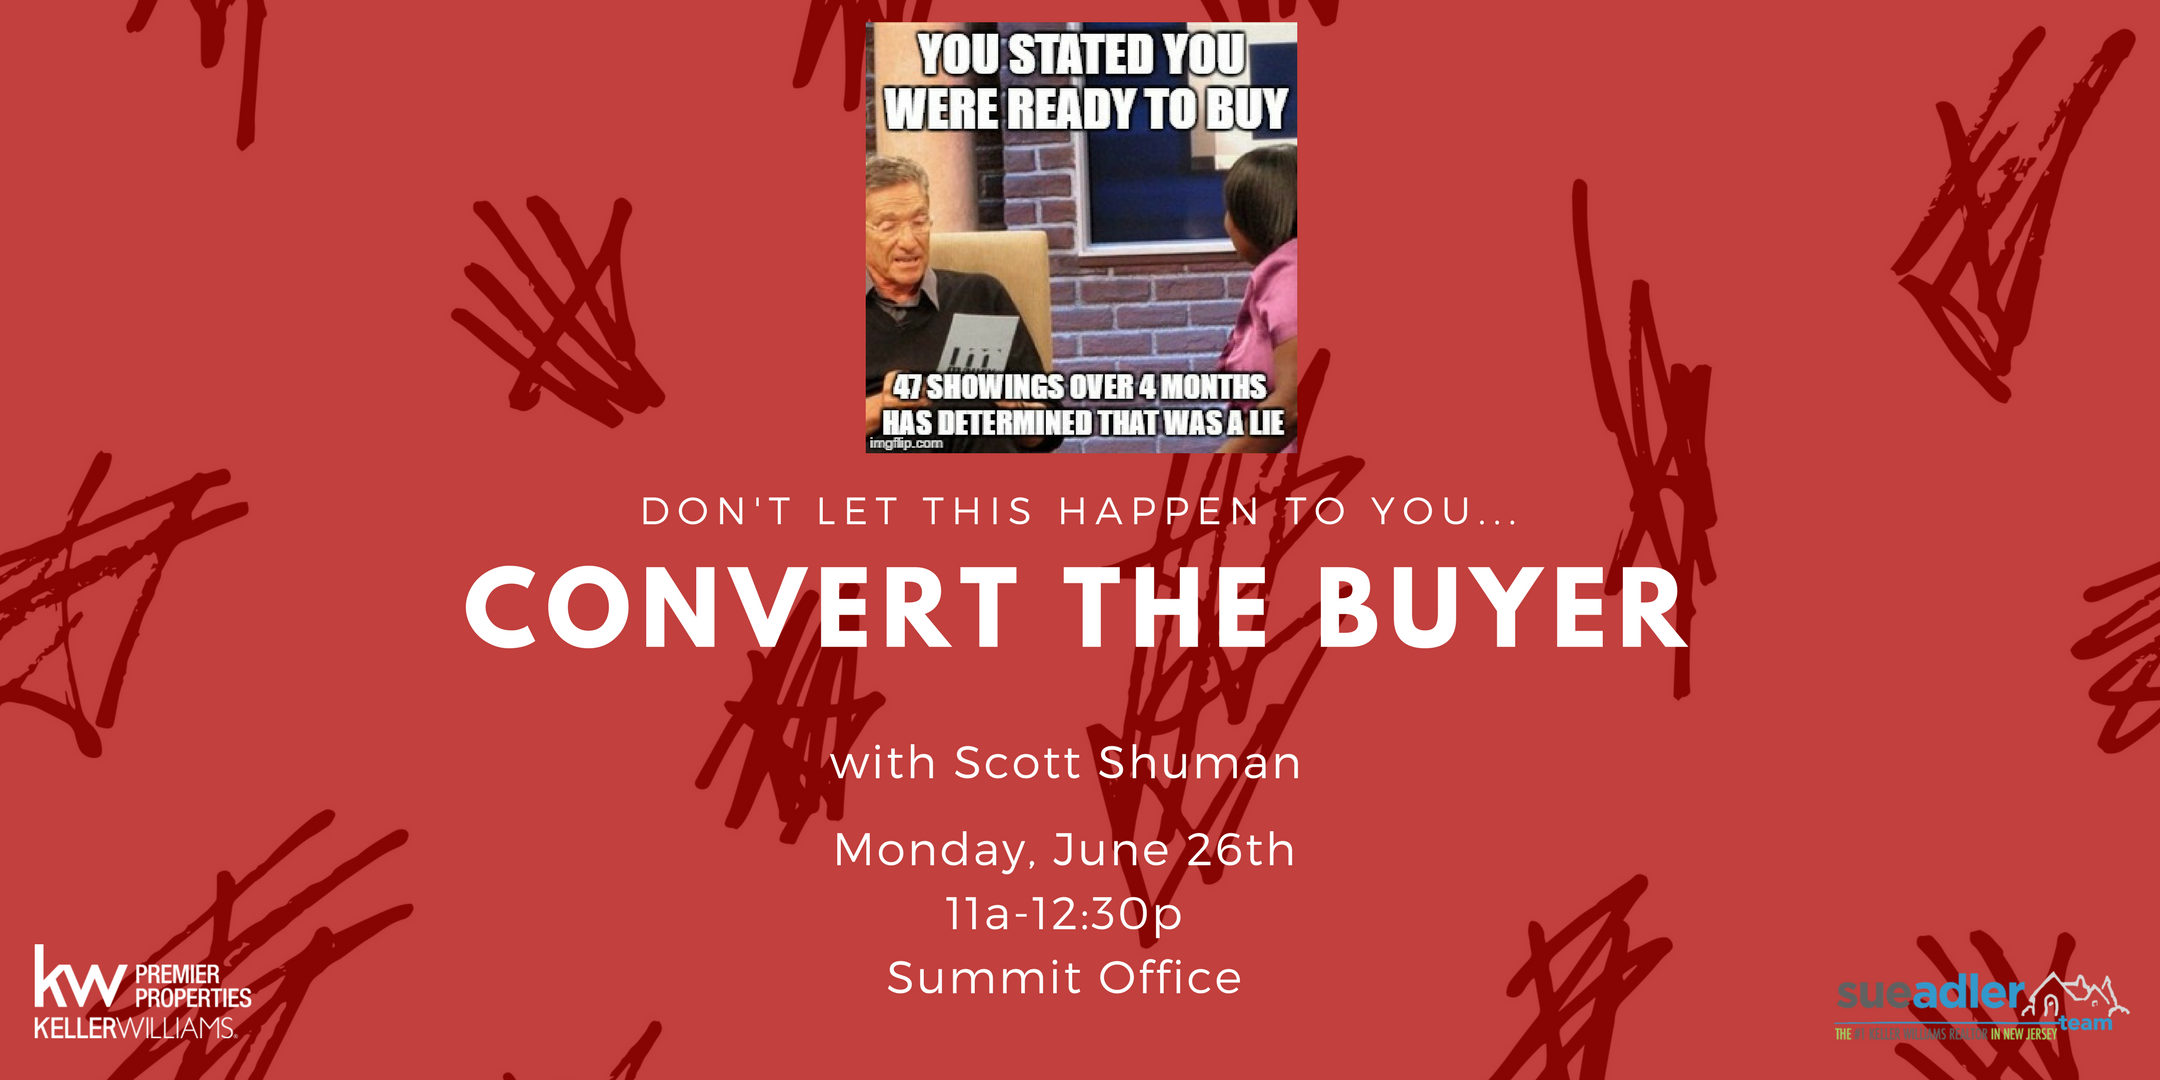 How to Convert Buyers with Scott Shuman